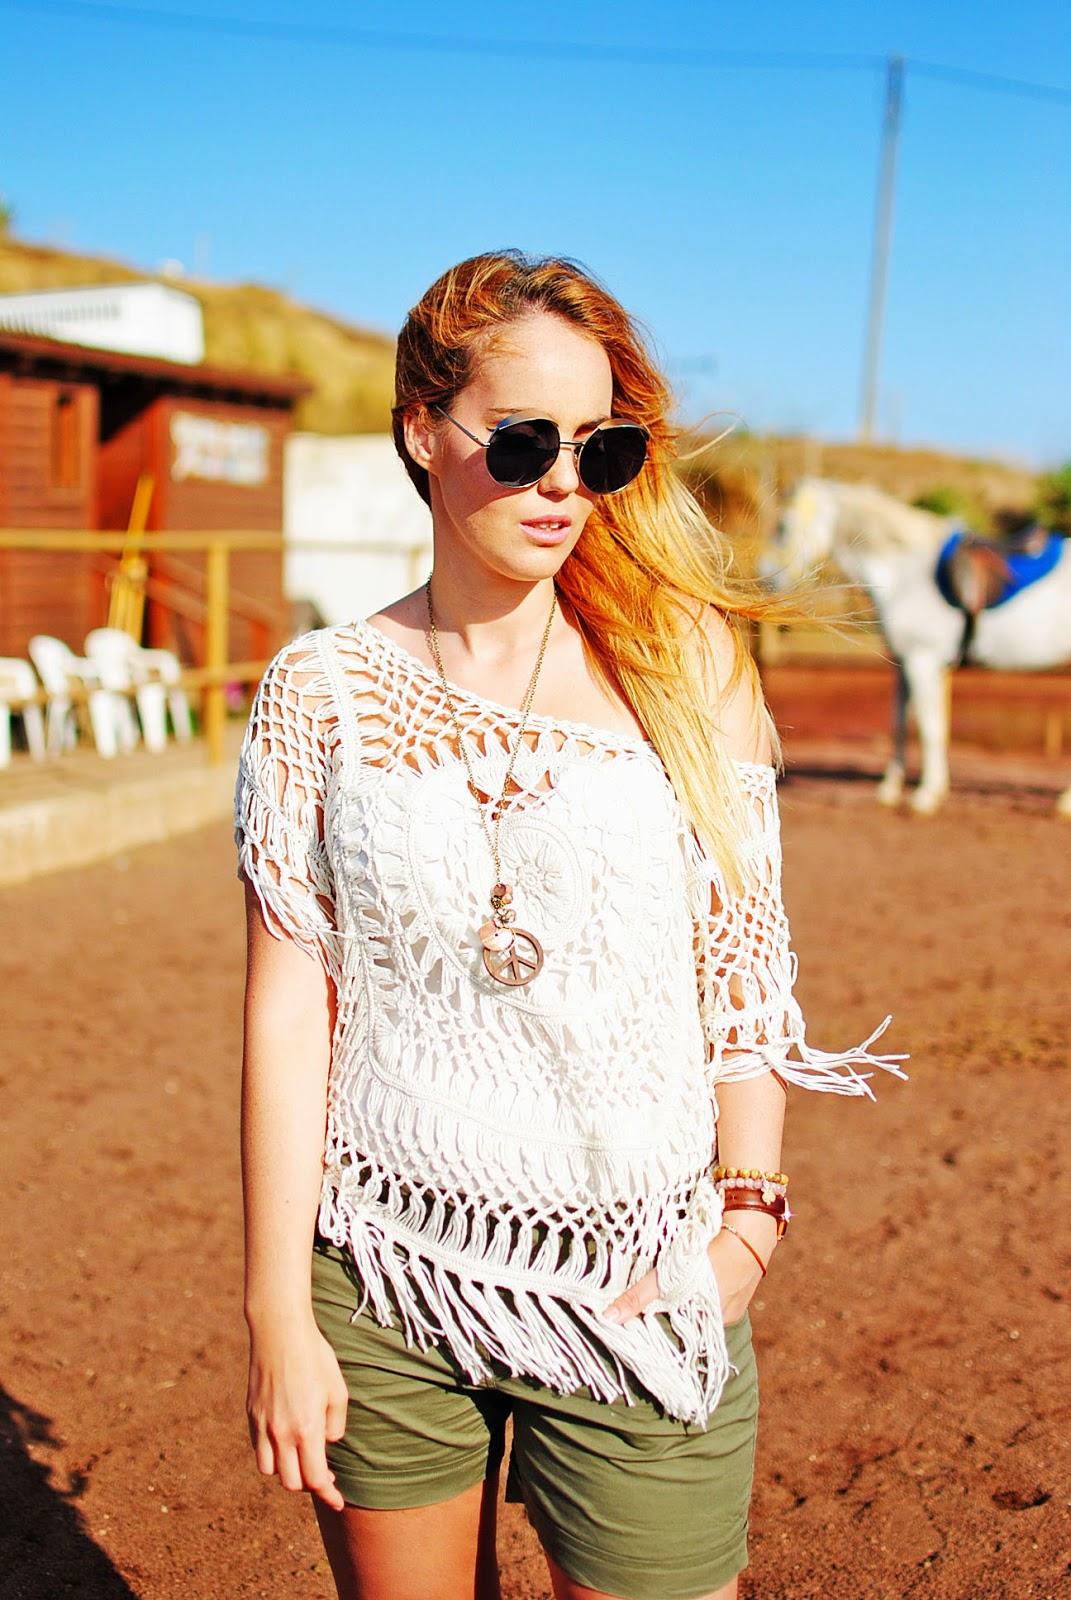 #CyATenerife, ganchillo, nery hdez, look sport, crochet , 80spurple, peace necklace